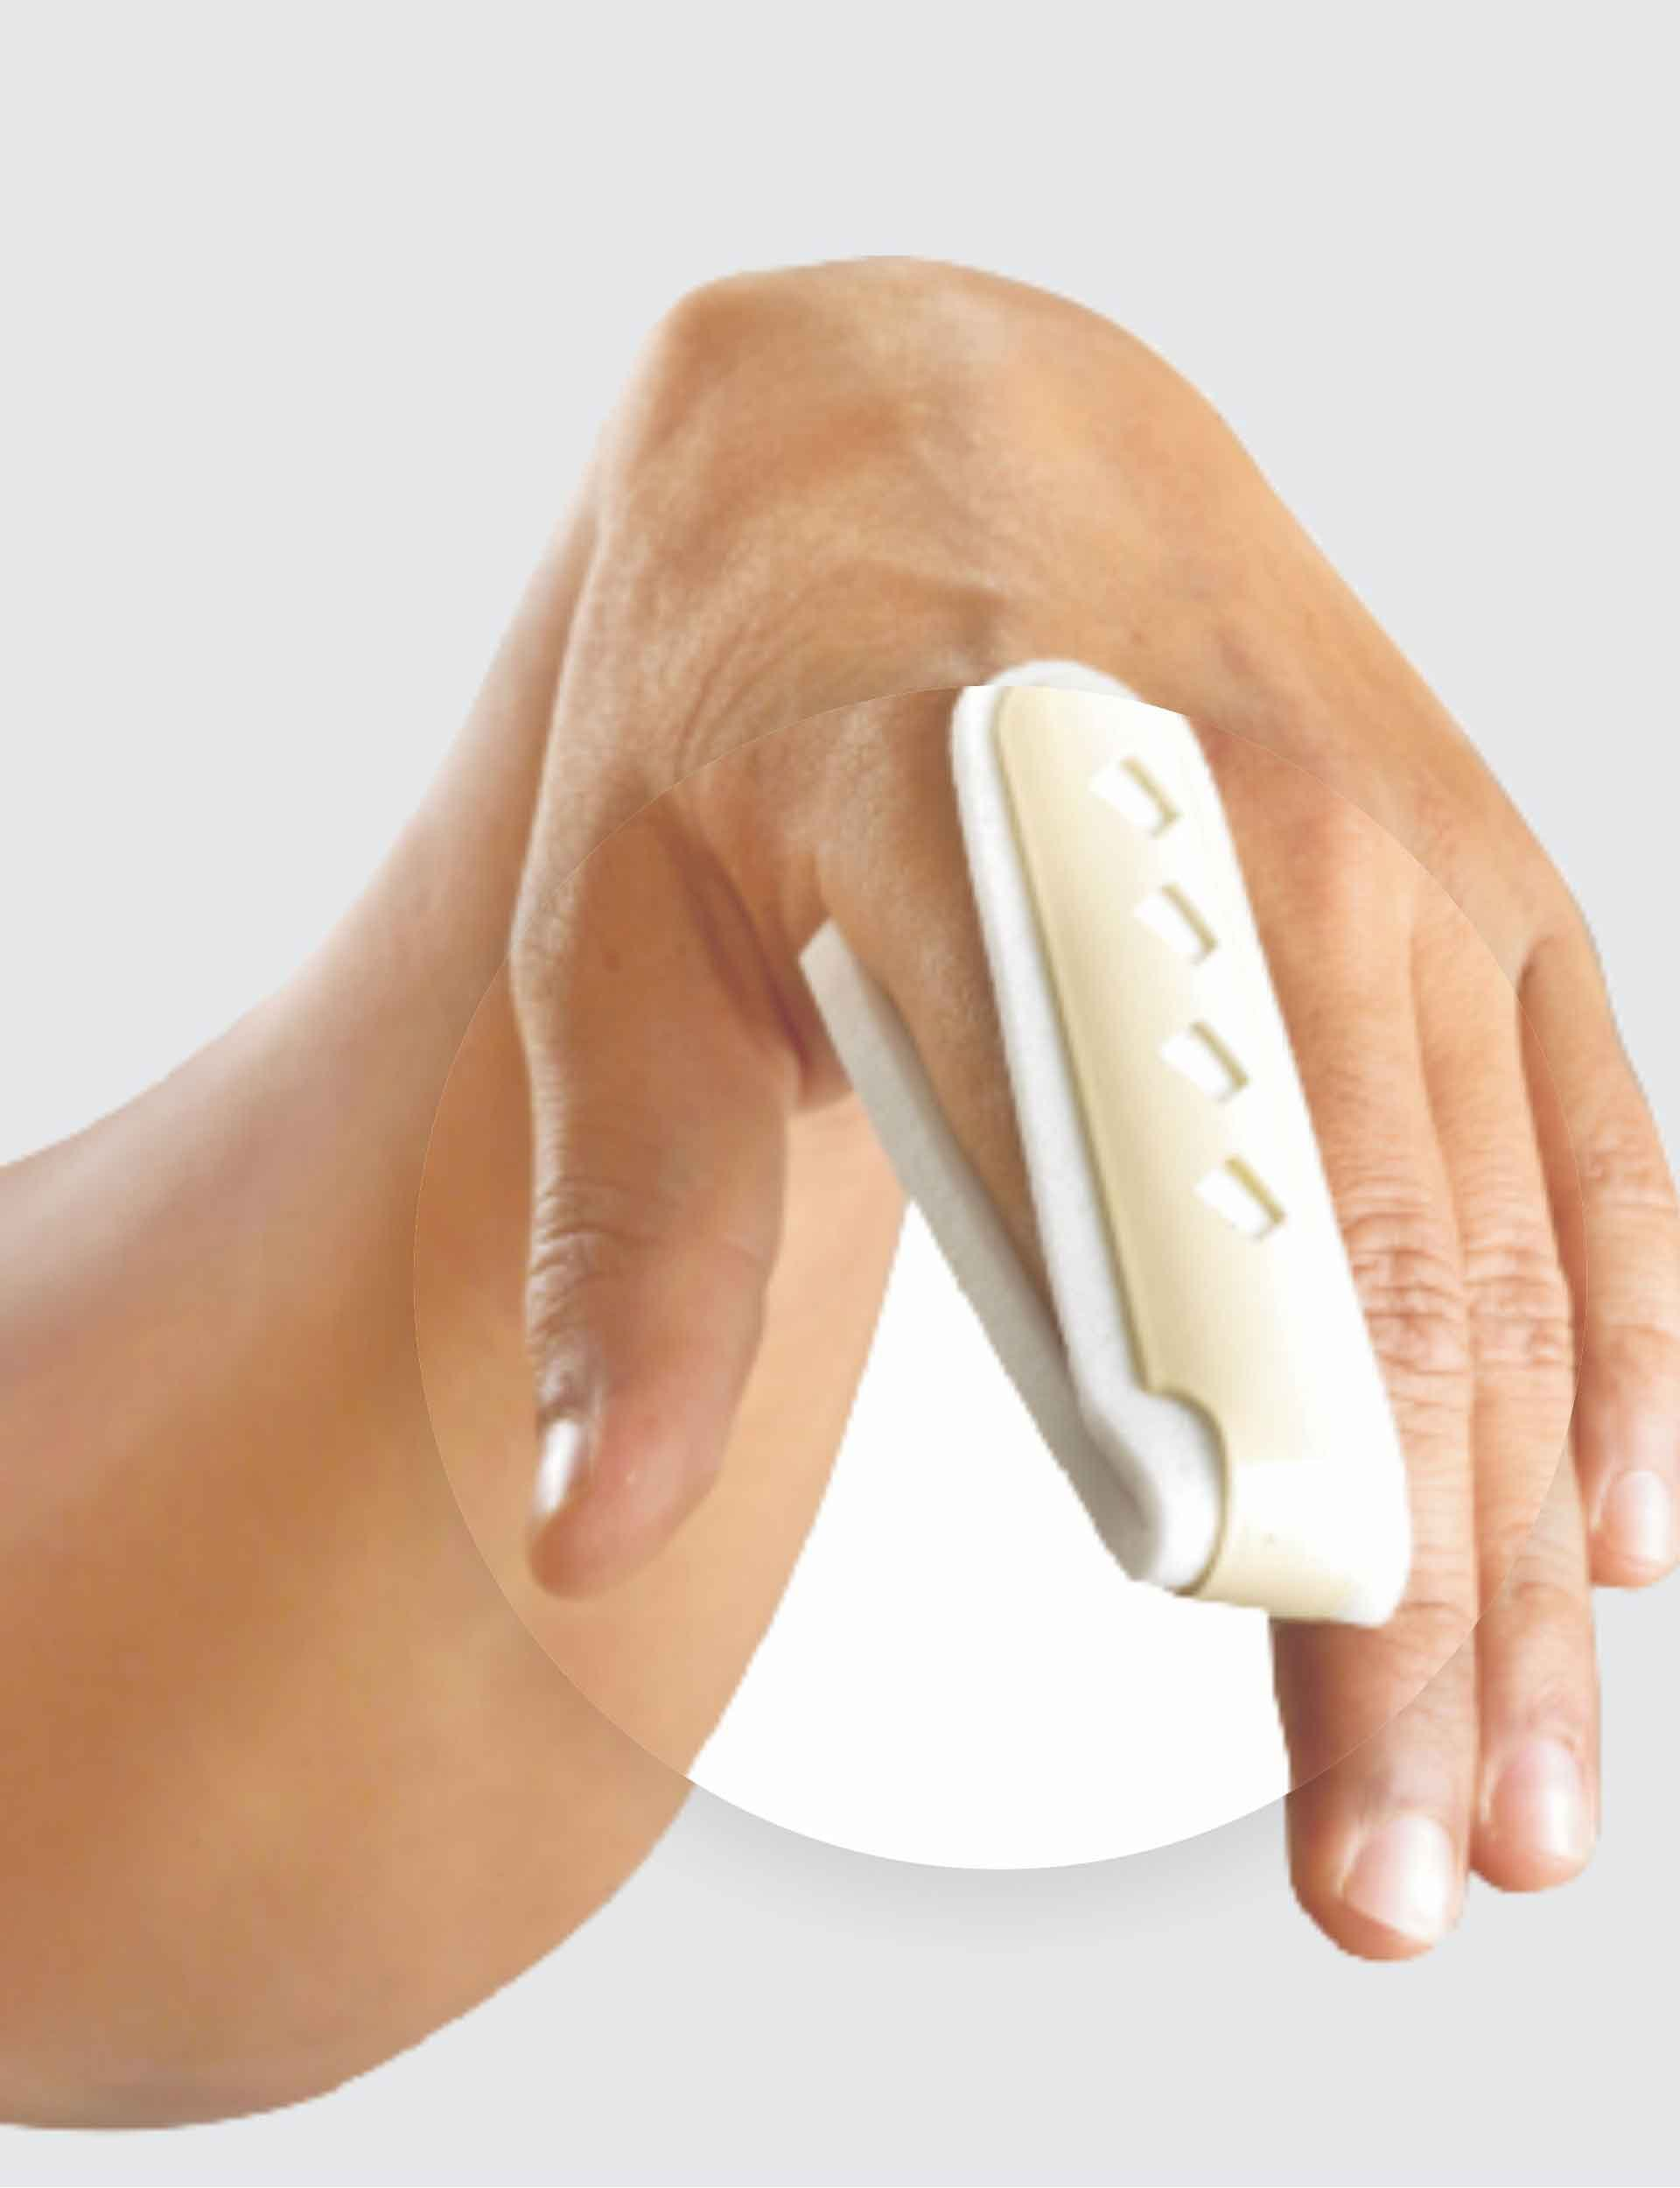 Dyna Finger Cot - Finger Splint One Size Fits Most